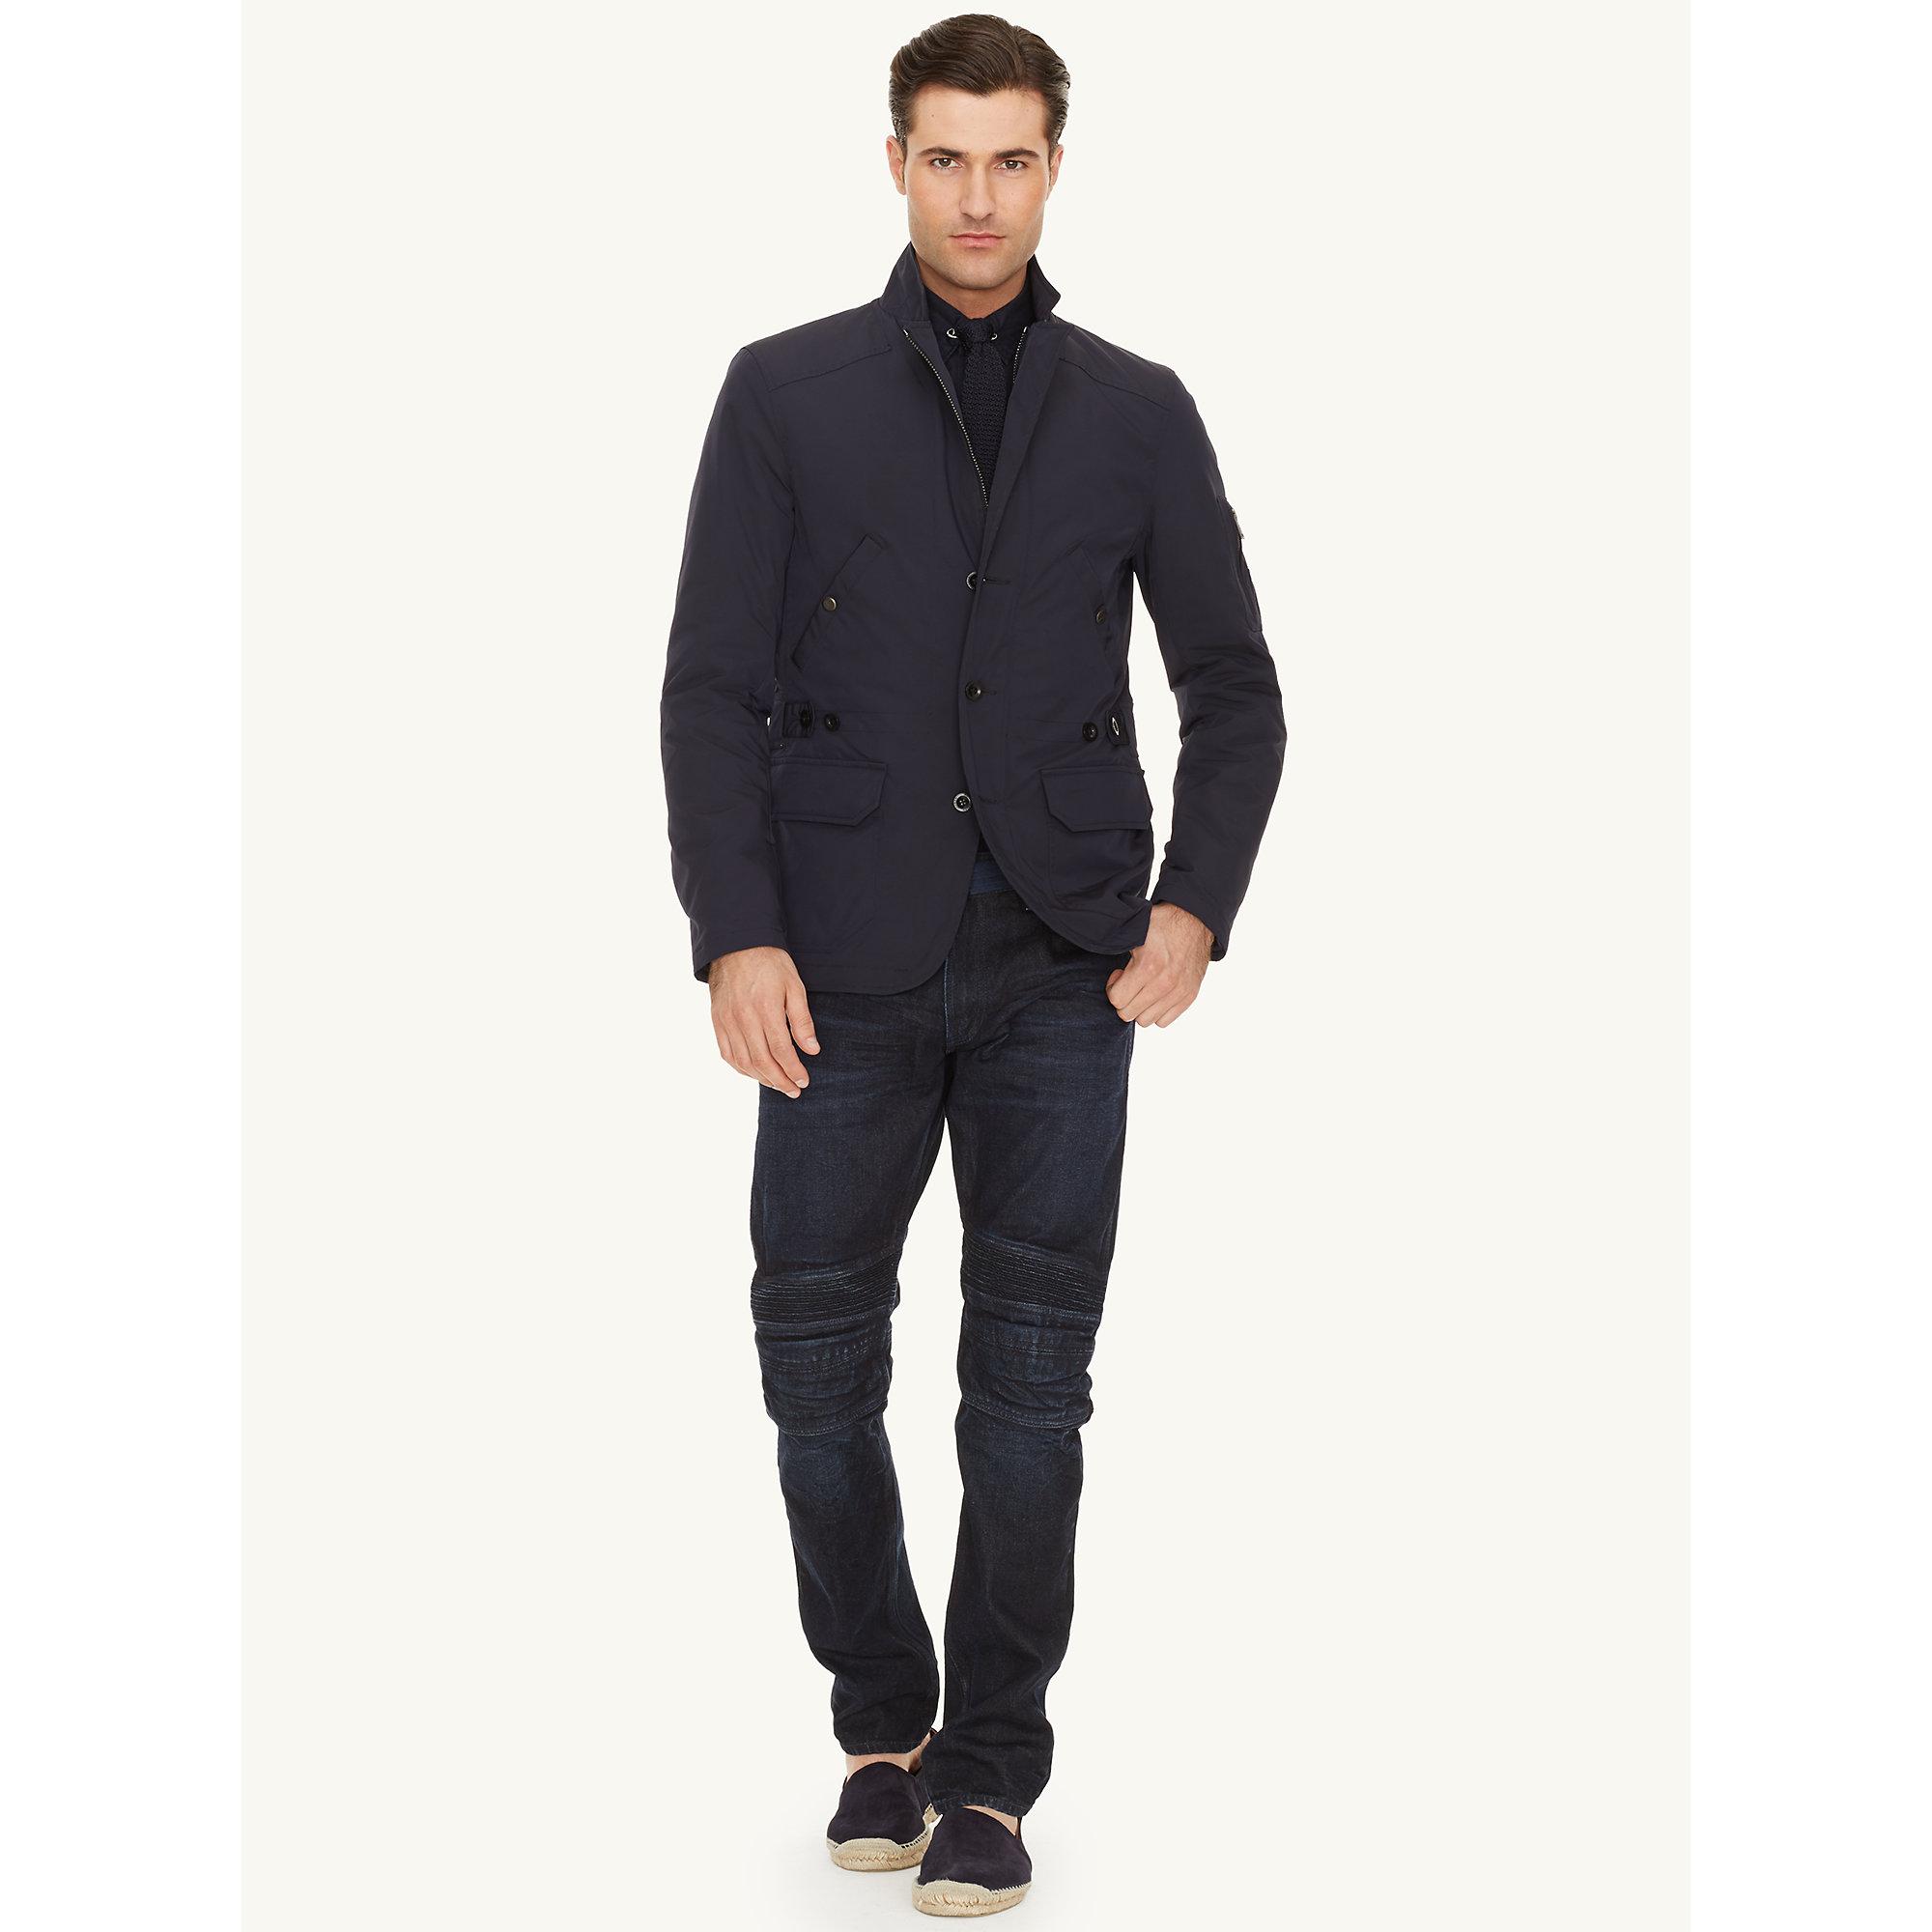 Ralph lauren black label Military Sport Coat in Black for Men | Lyst